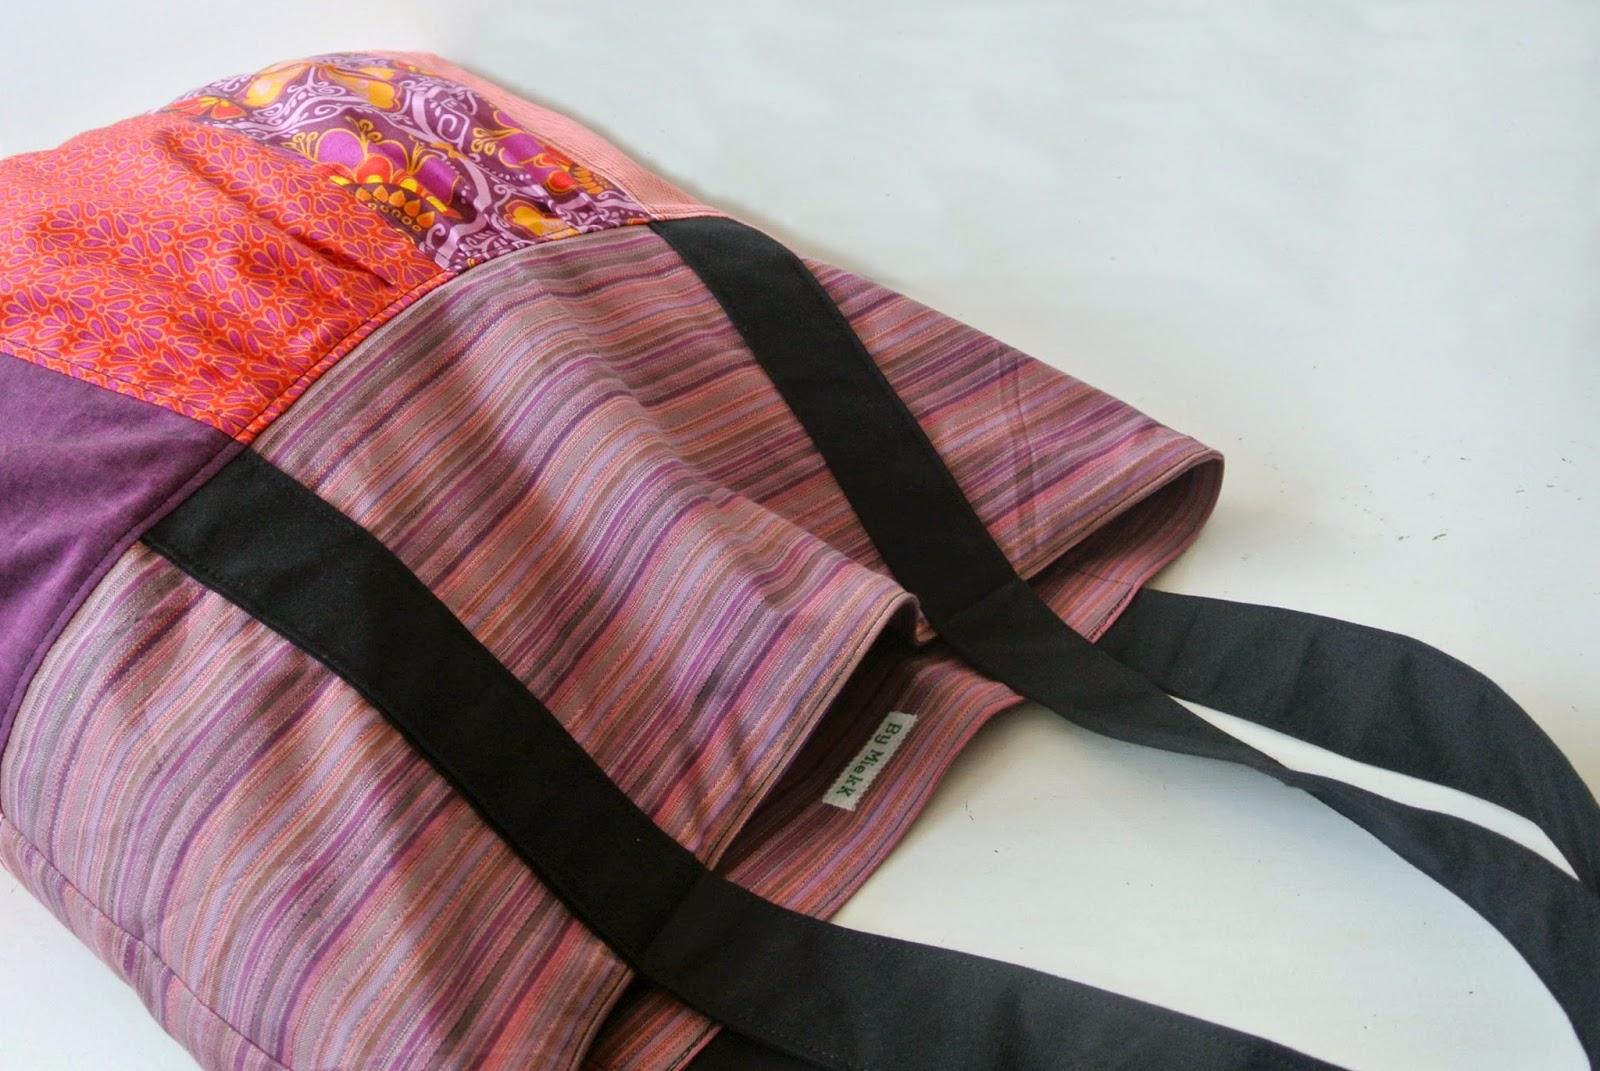 Stoffen Tassen Met Opdruk : Sew natural vier stoffen tassen om zelf te maken